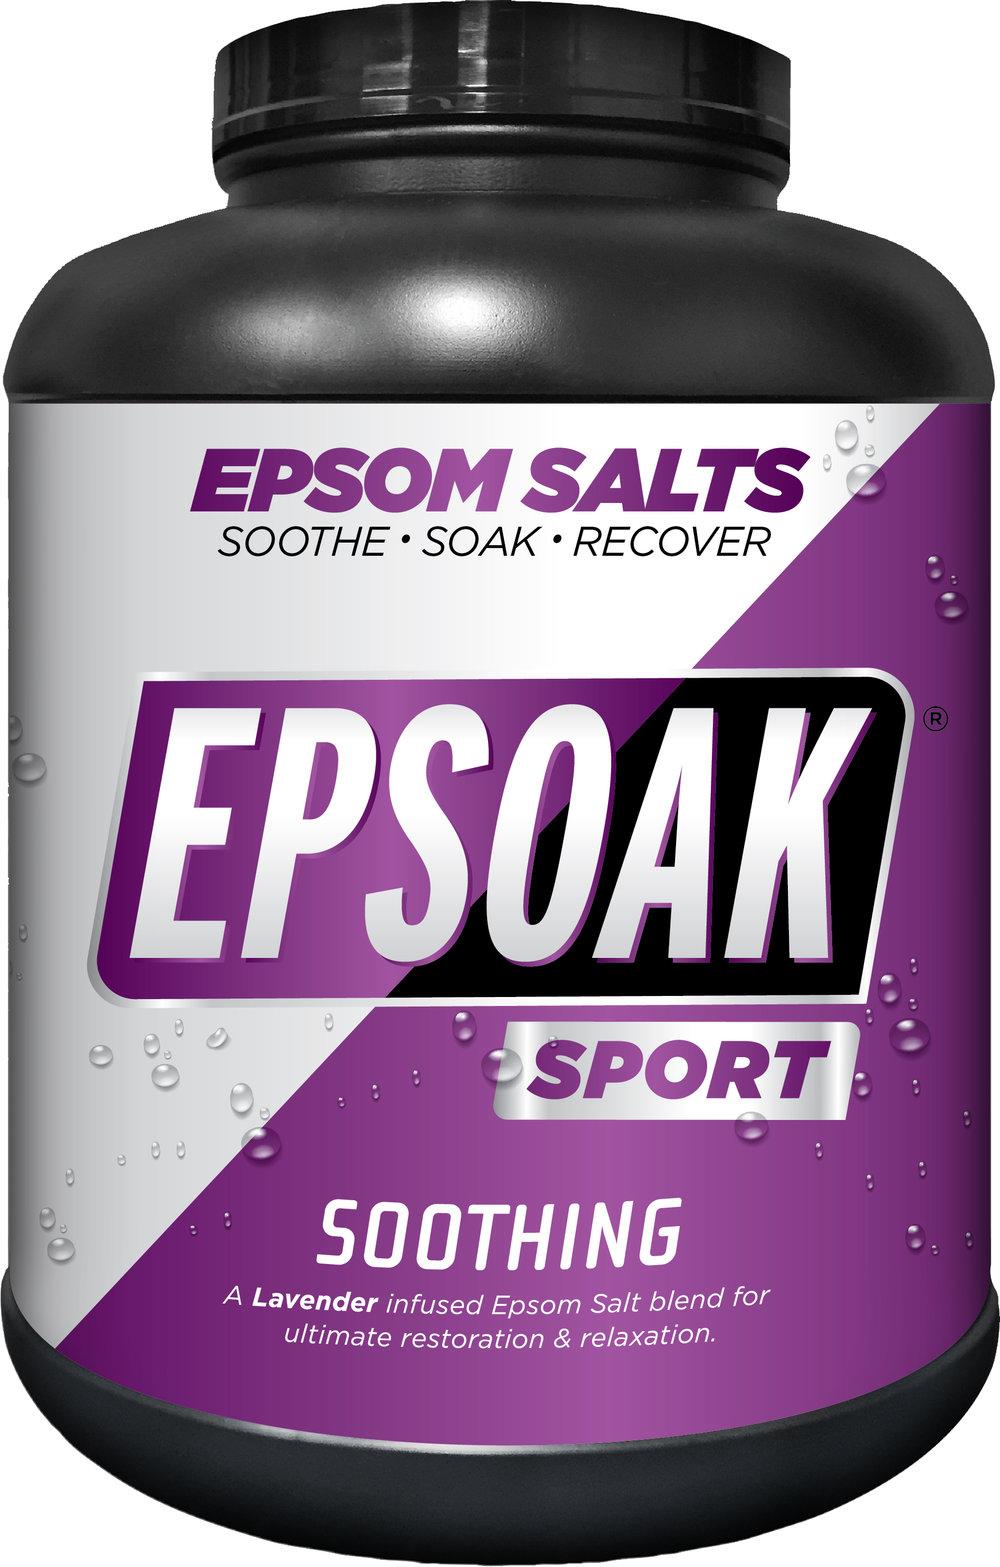 EPSOAK-SPORT_SOOTHING_FRONT.jpg